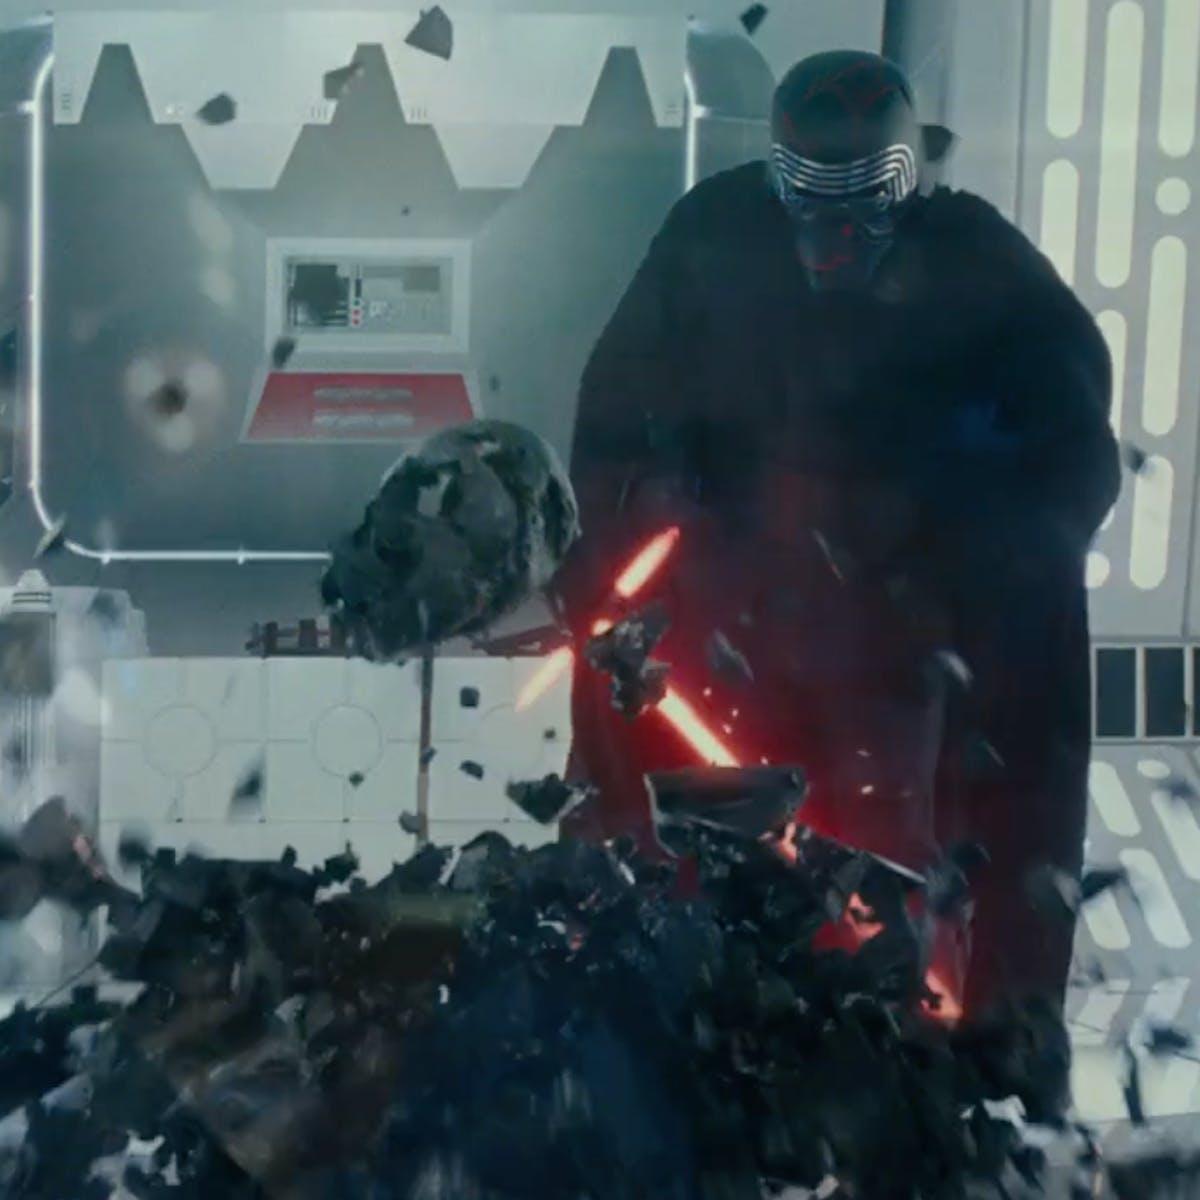 Rey and Kylo seem to destroy Vader's mask in final 'Star Wars 9' trailer